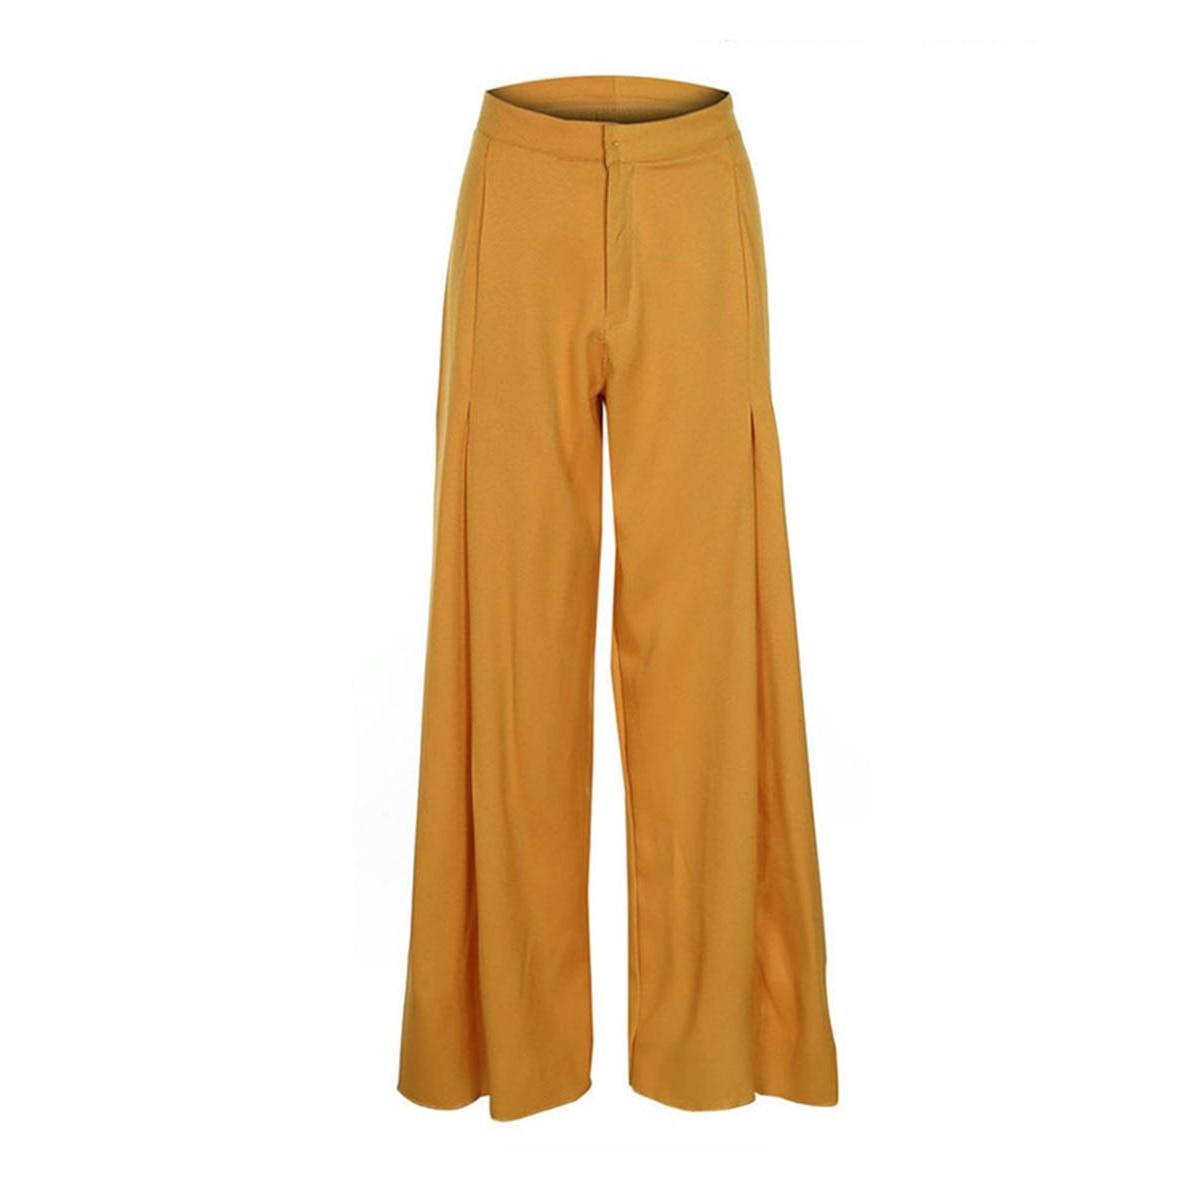 Kinikiss 2019  High Waist Women Casual Pants Wide Legs Fall Yellow Autumn White Loose Button Zipper Fashion Pleated Female Pants